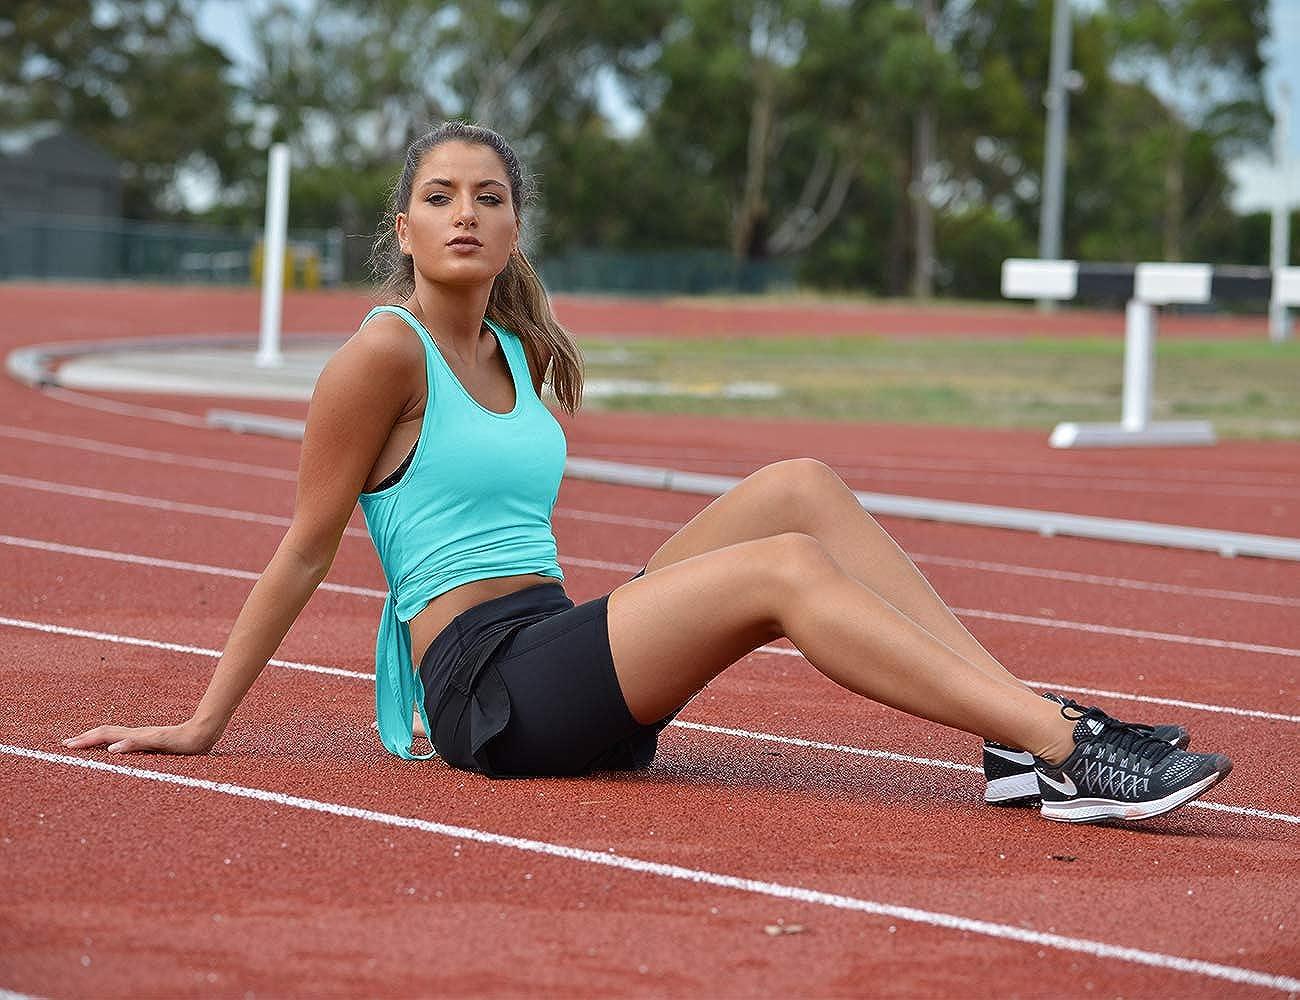 icyzone Damen R/ückenfrei Yoga Tank Tops /Ärmellos Workout Fitness Shirts